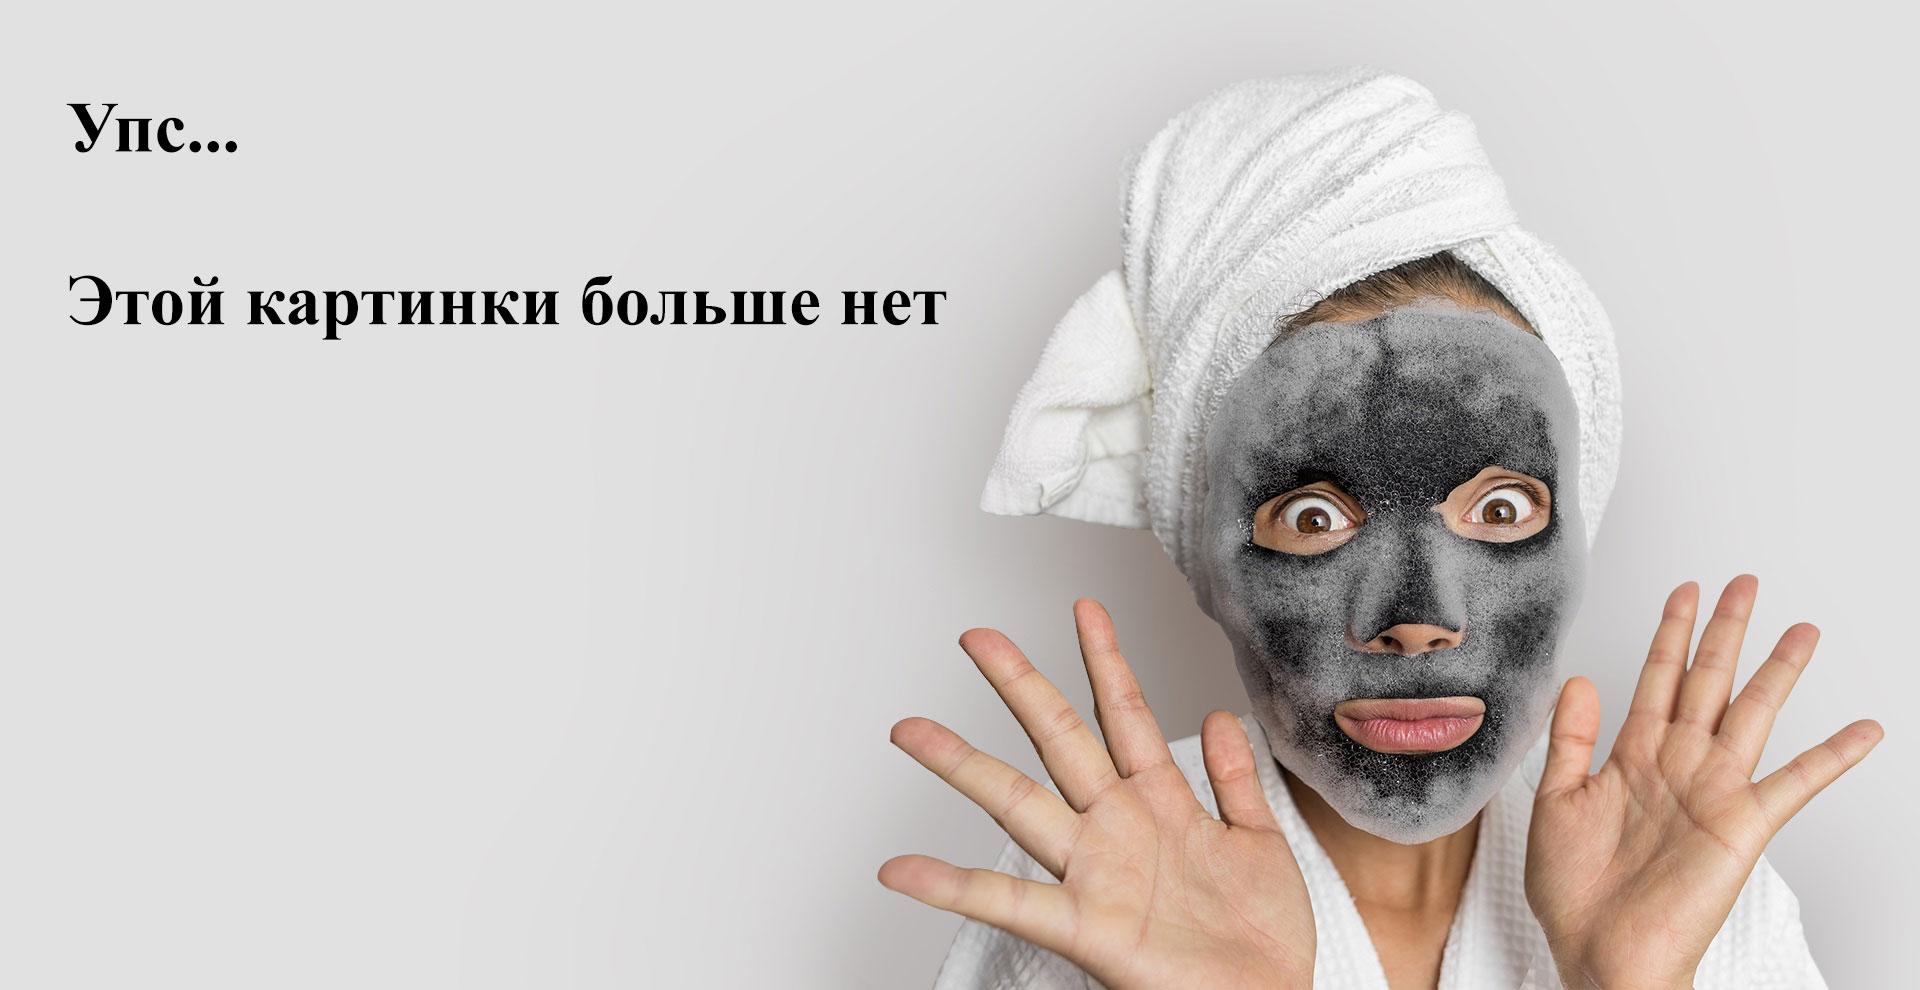 Dr.Koжevatkin, Энзимная пудра с экстрактом малины, 150 мл